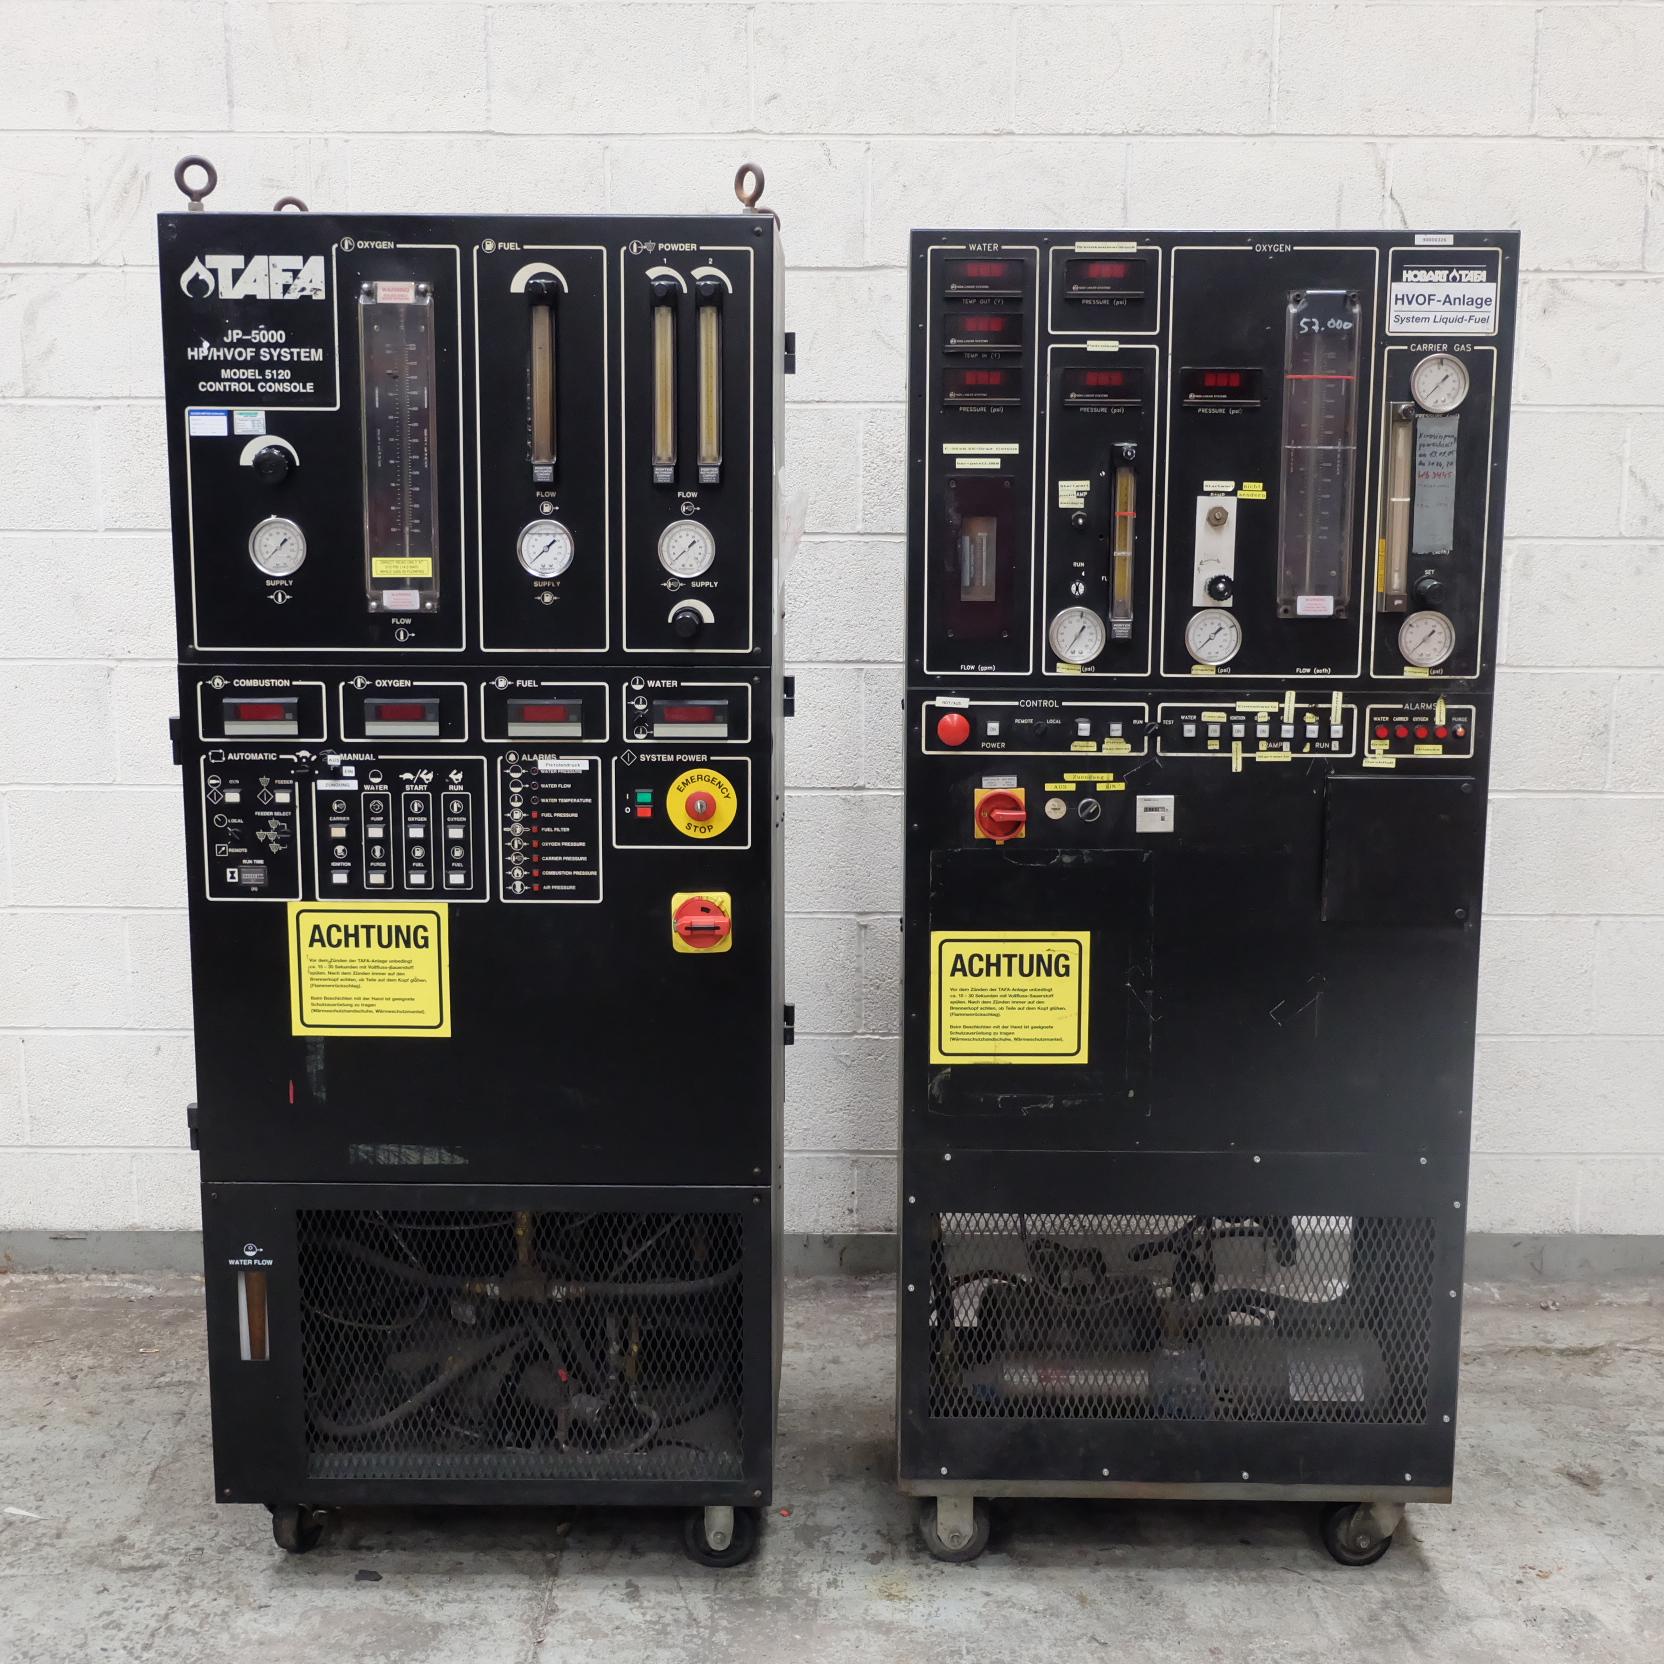 Lot 41 - A TAFA JP-5000 HP HVOF Flame Spray System with Mod